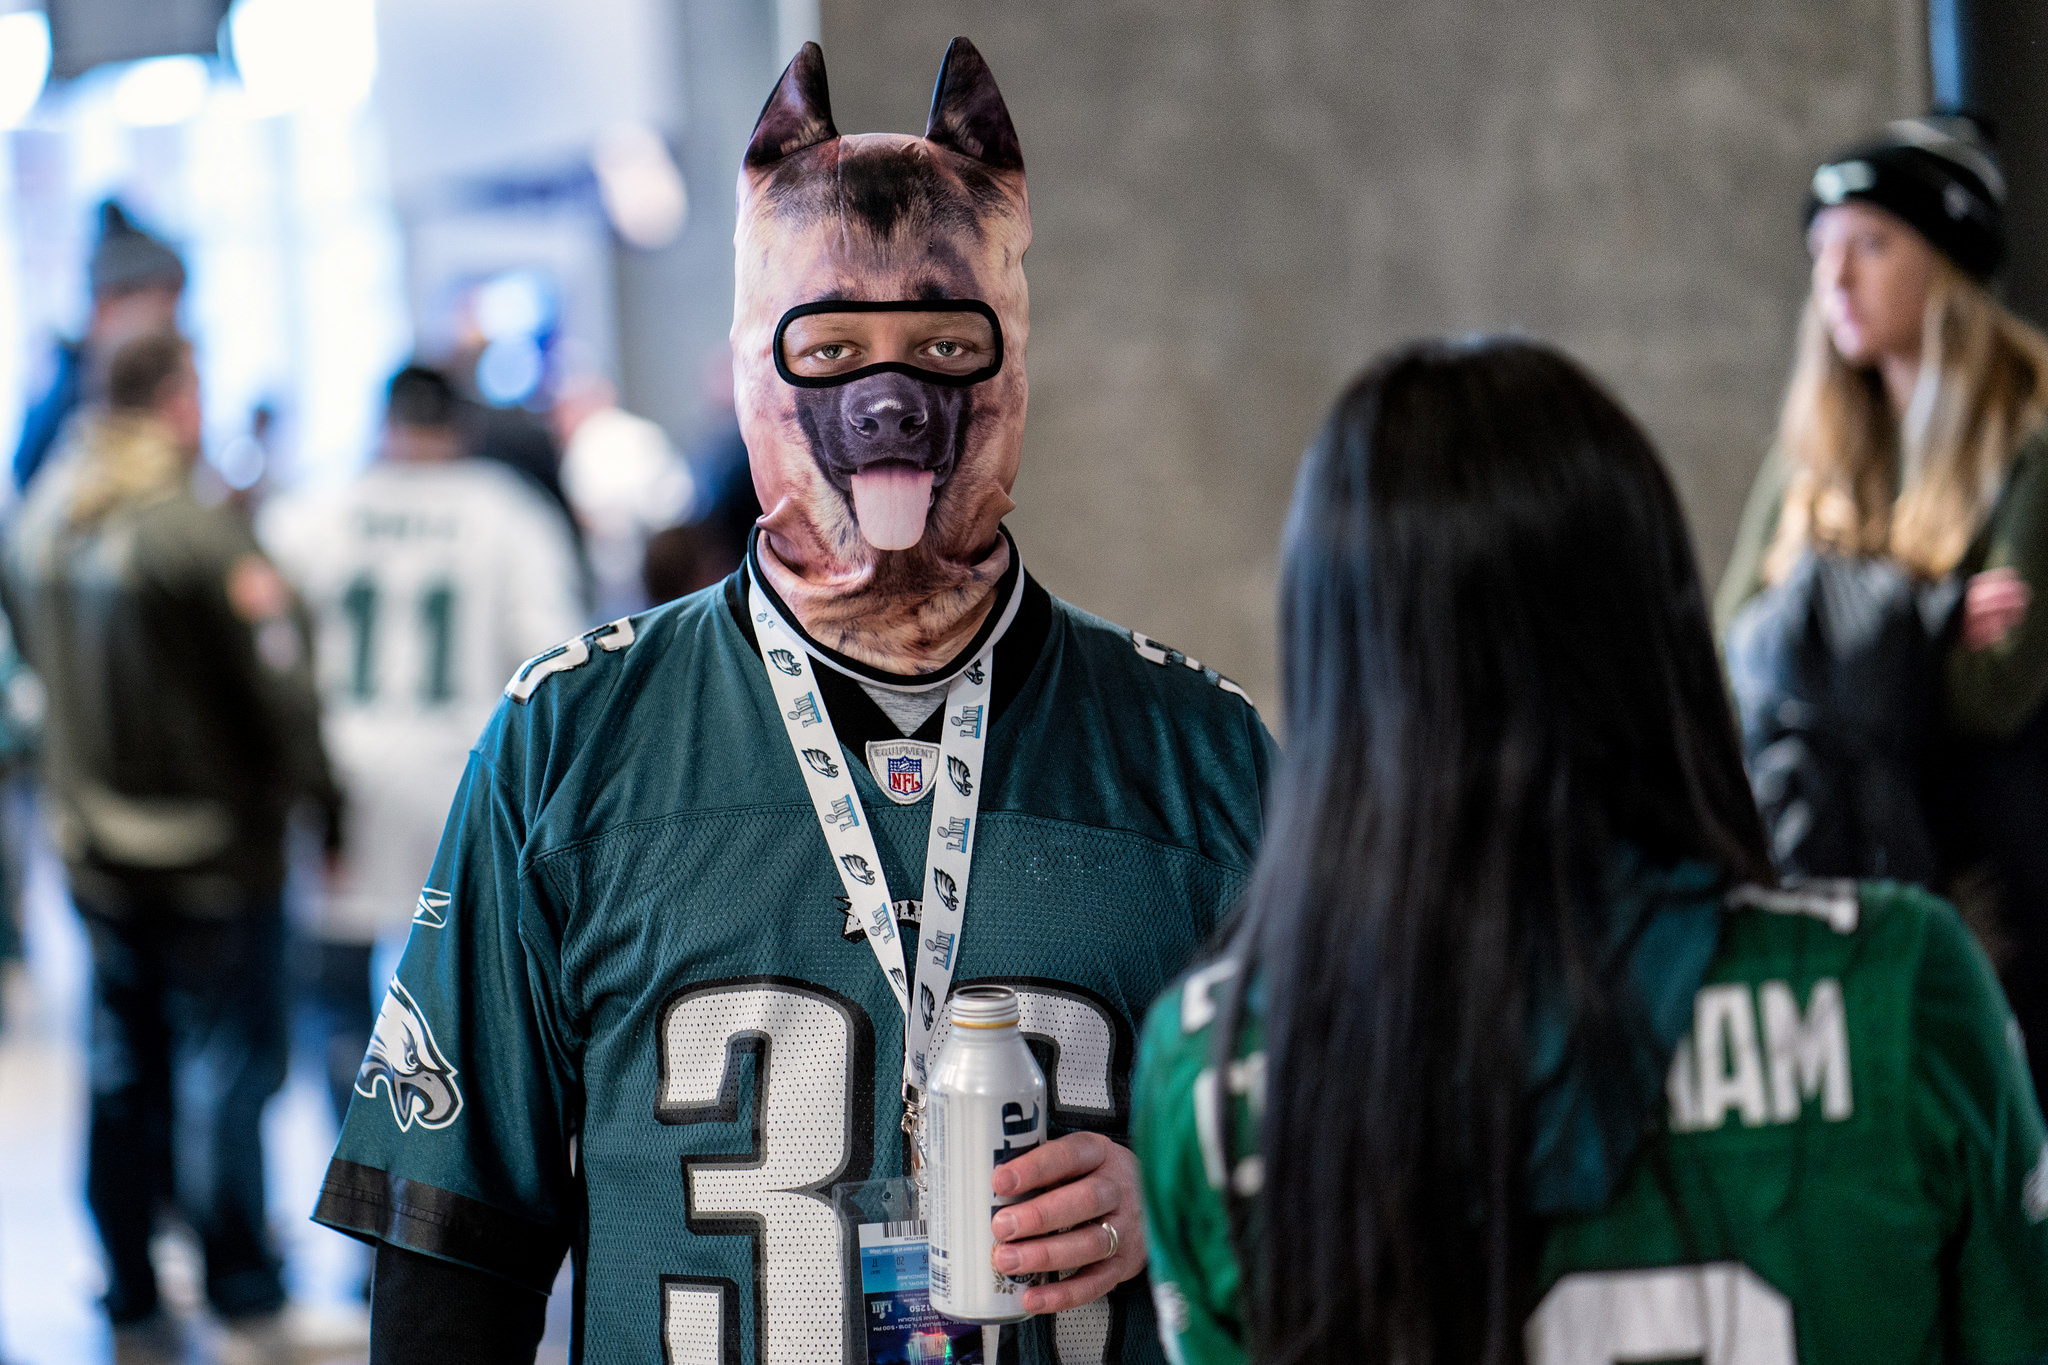 Every underdog needs a beer break. Super Bowl 2018, Minneapolis MN